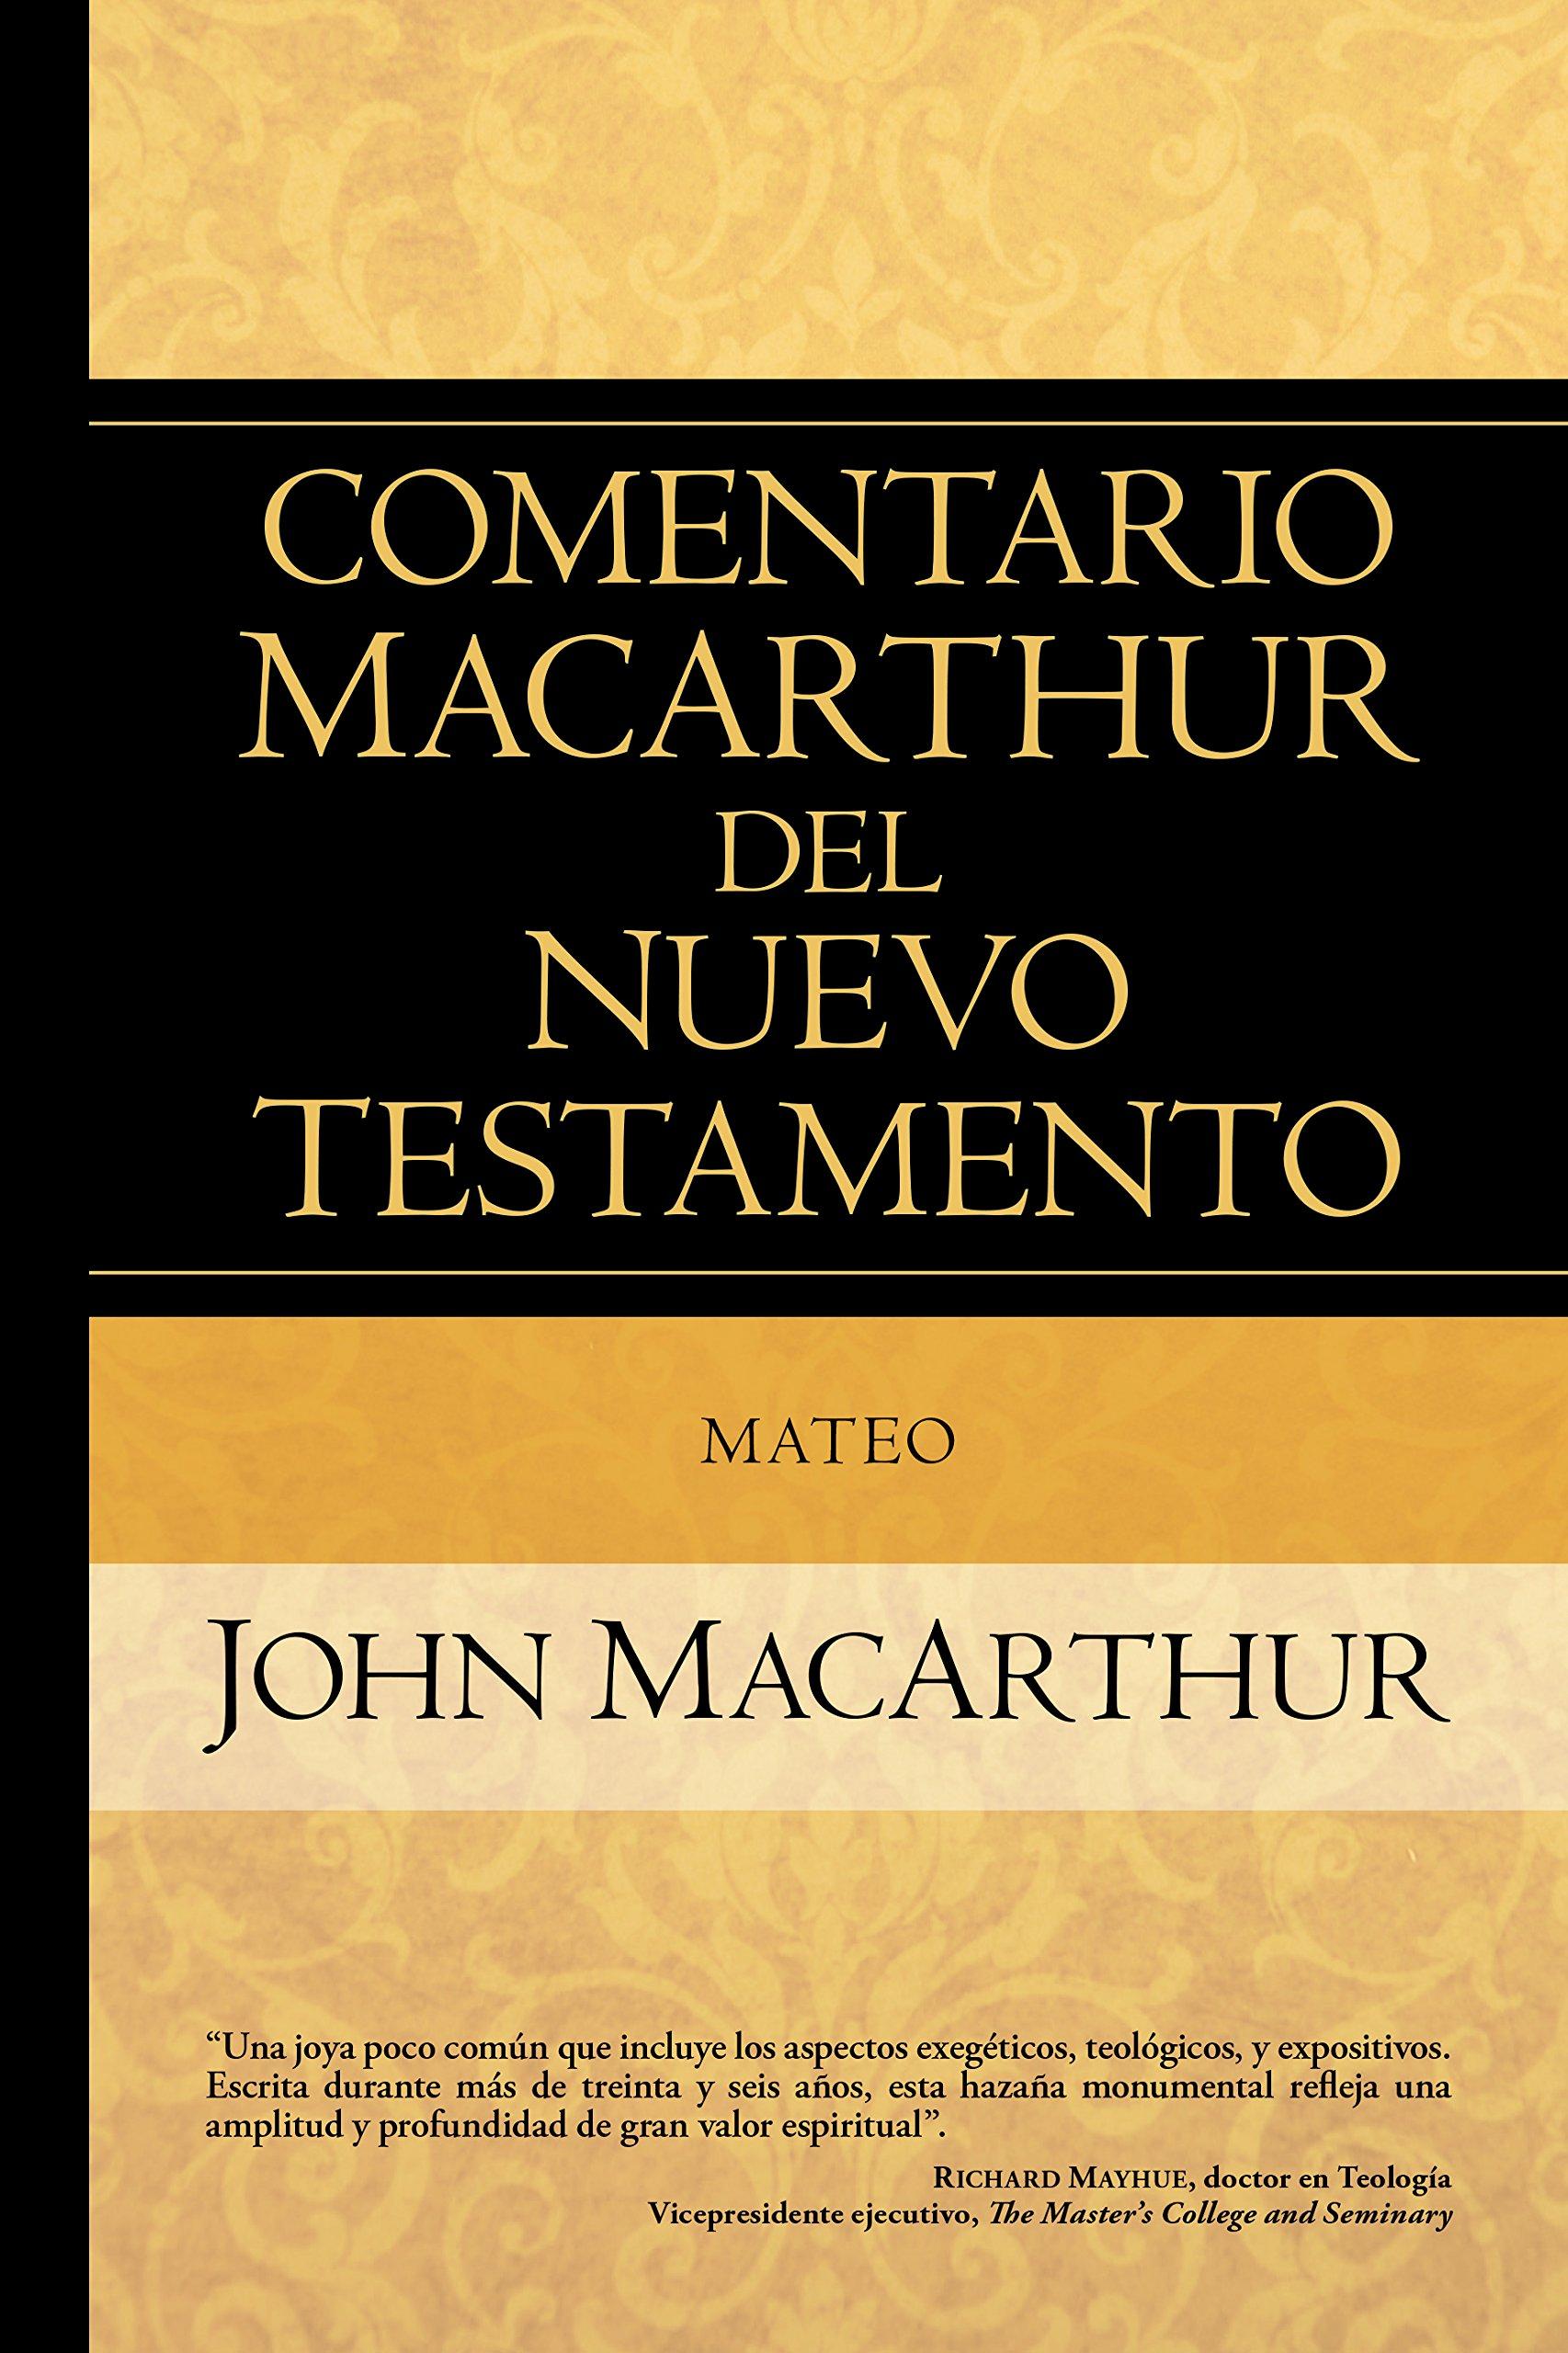 Mateo (Comentario MacArthur del N.T.) (Spanish Edition) (Spanish) Hardcover  – August 27, 2017